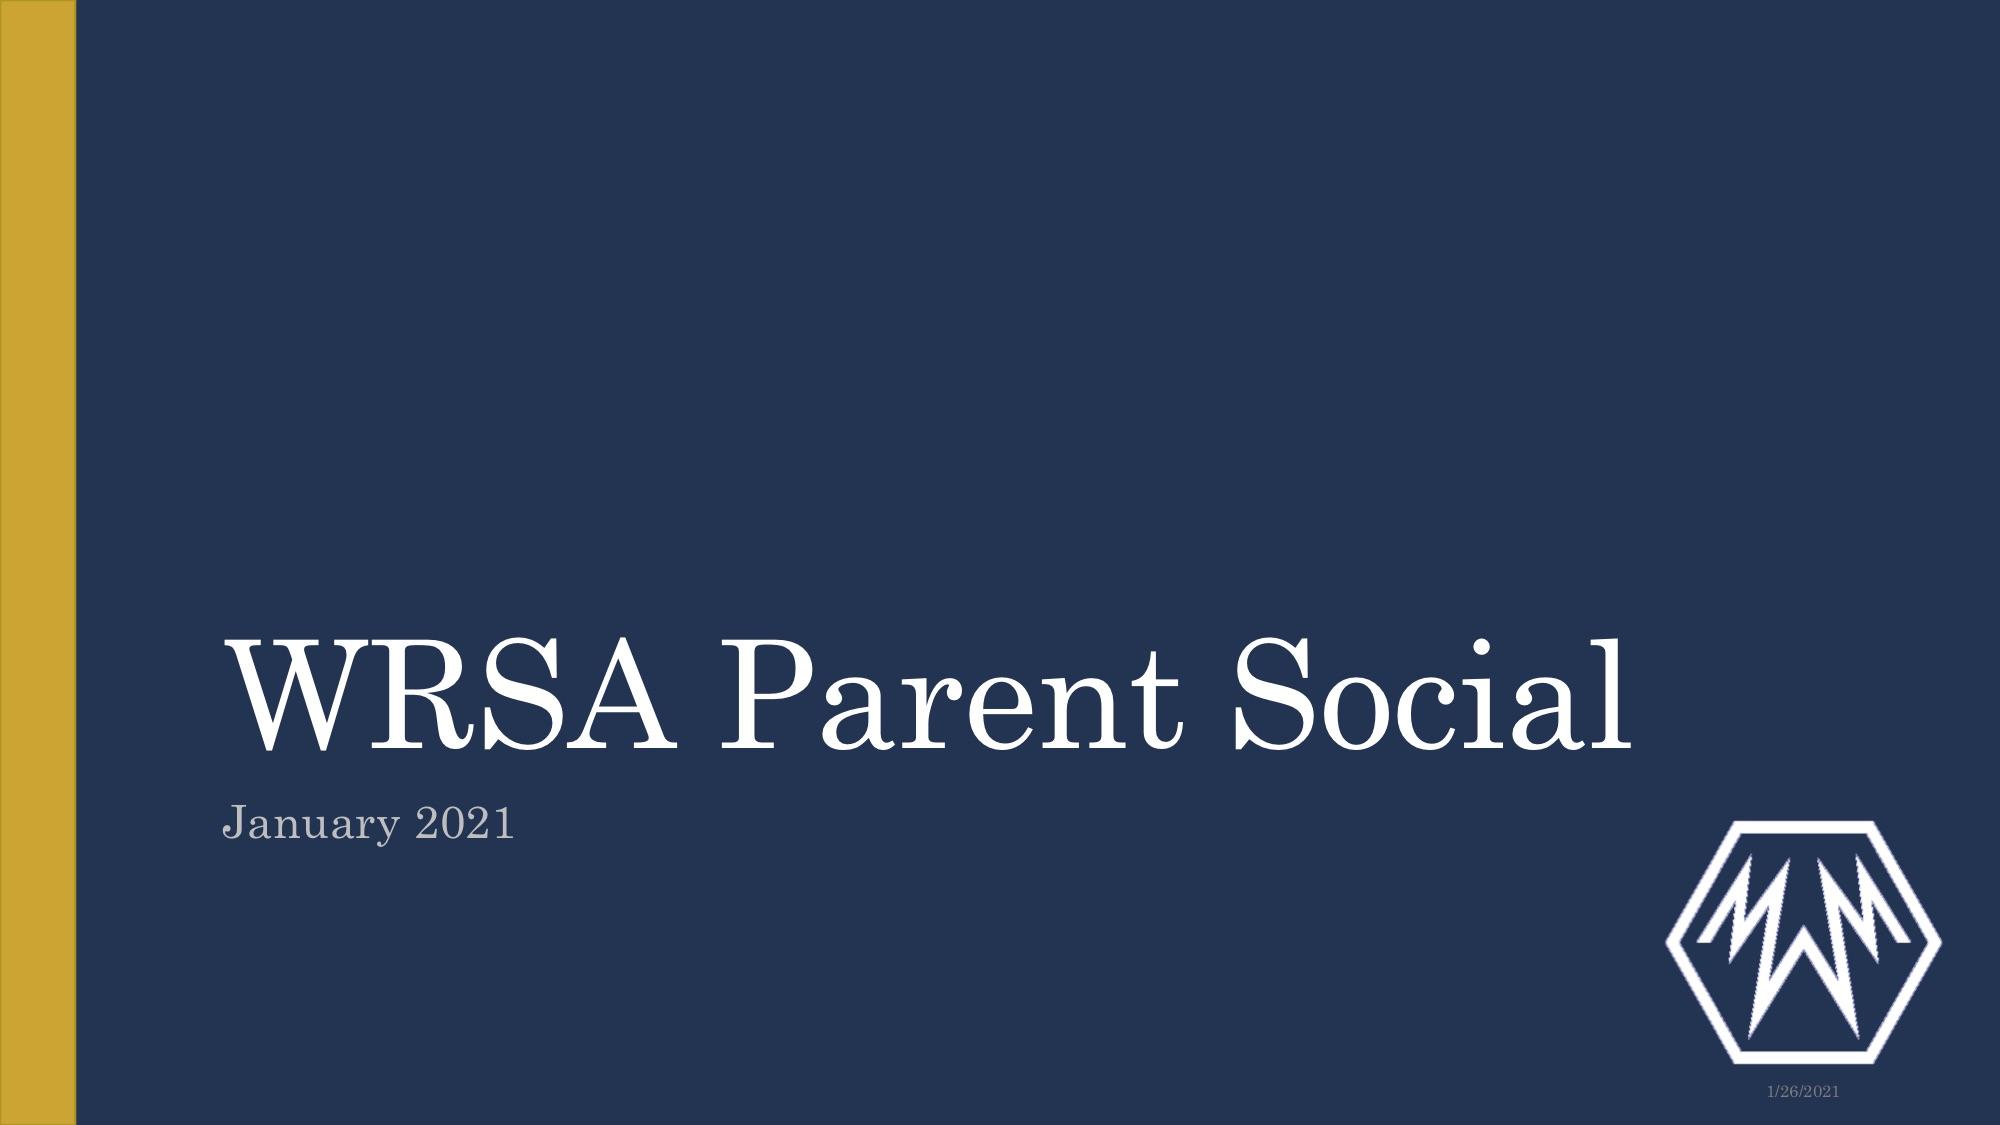 WRSA Parent Social Recap